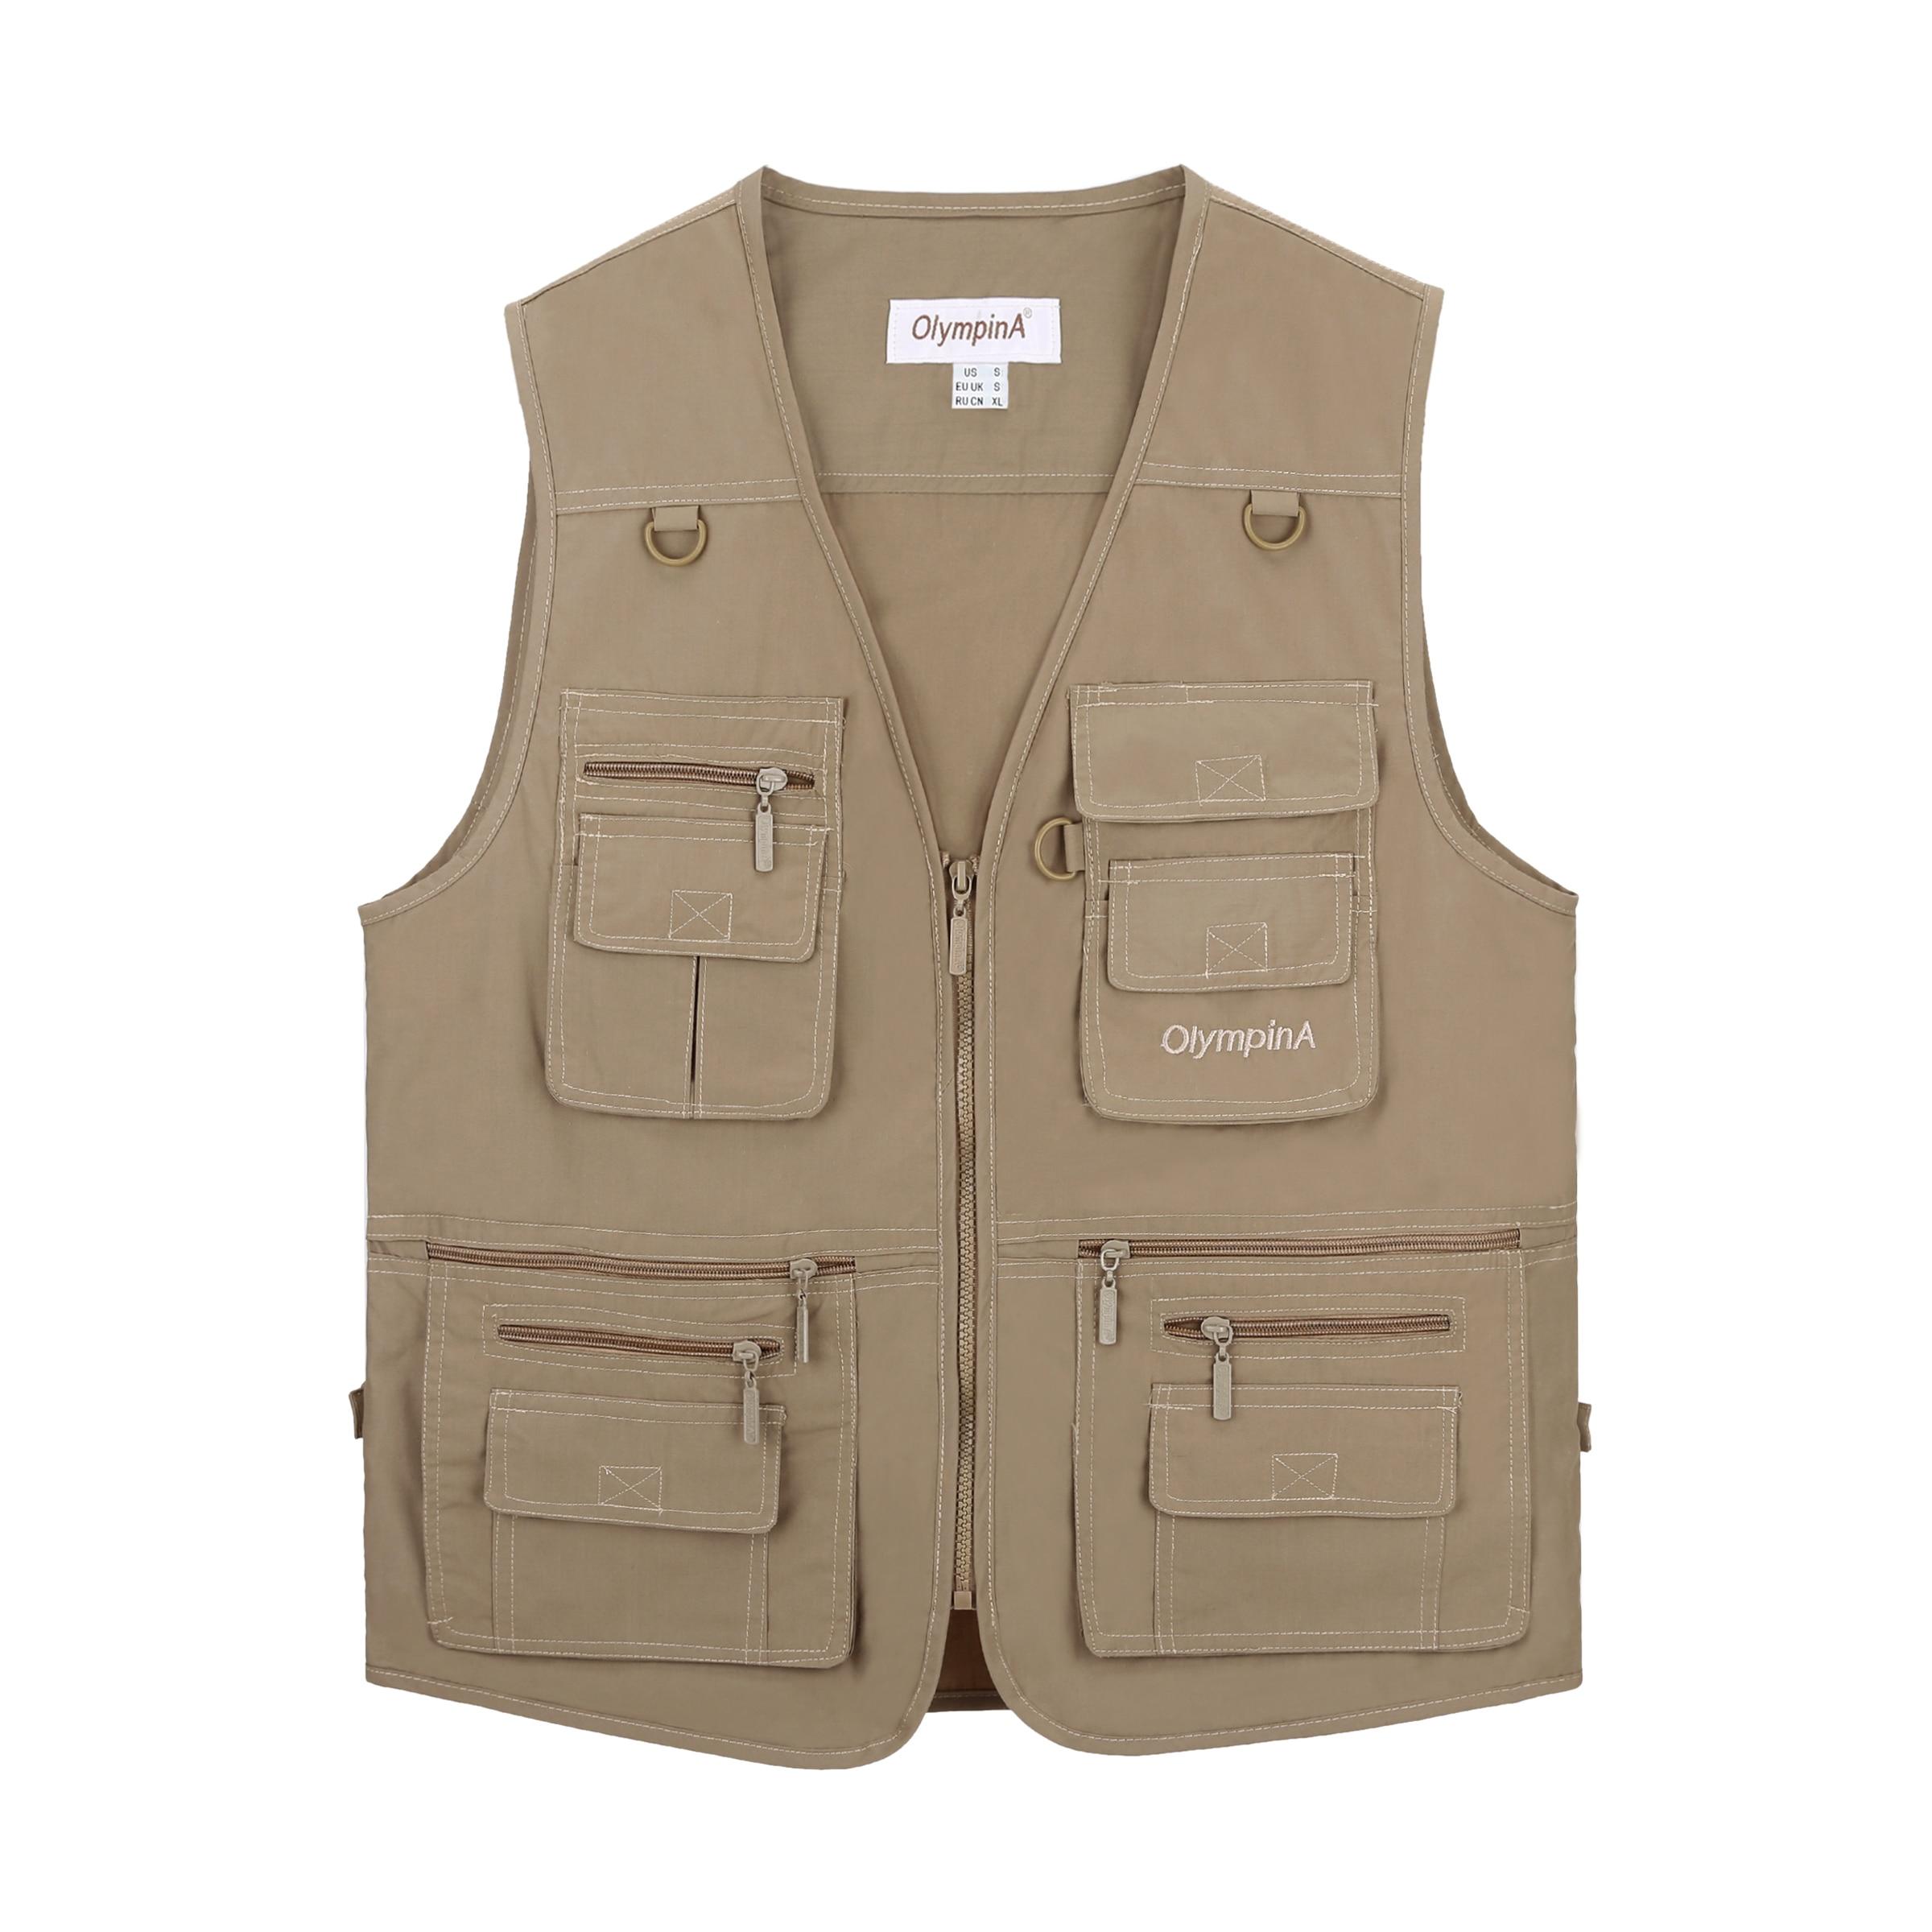 Fishing Vest Men Summer Traveler Sleeveless Jackets Waistcoat Outdoors Casual Vest With Many Pockets Large Size 5XL